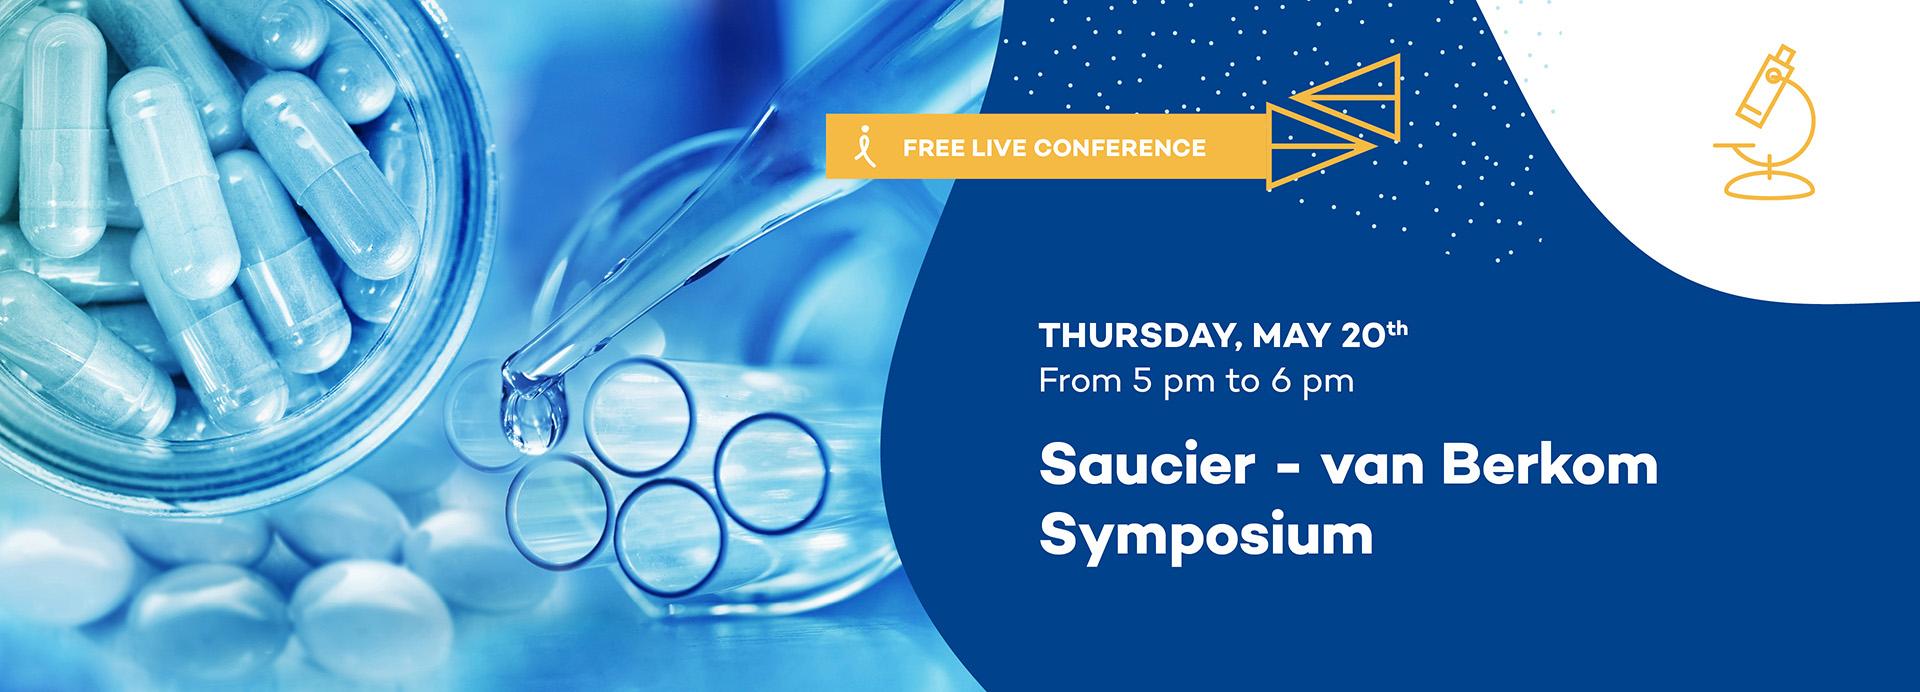 Slider_Symposium_2104212